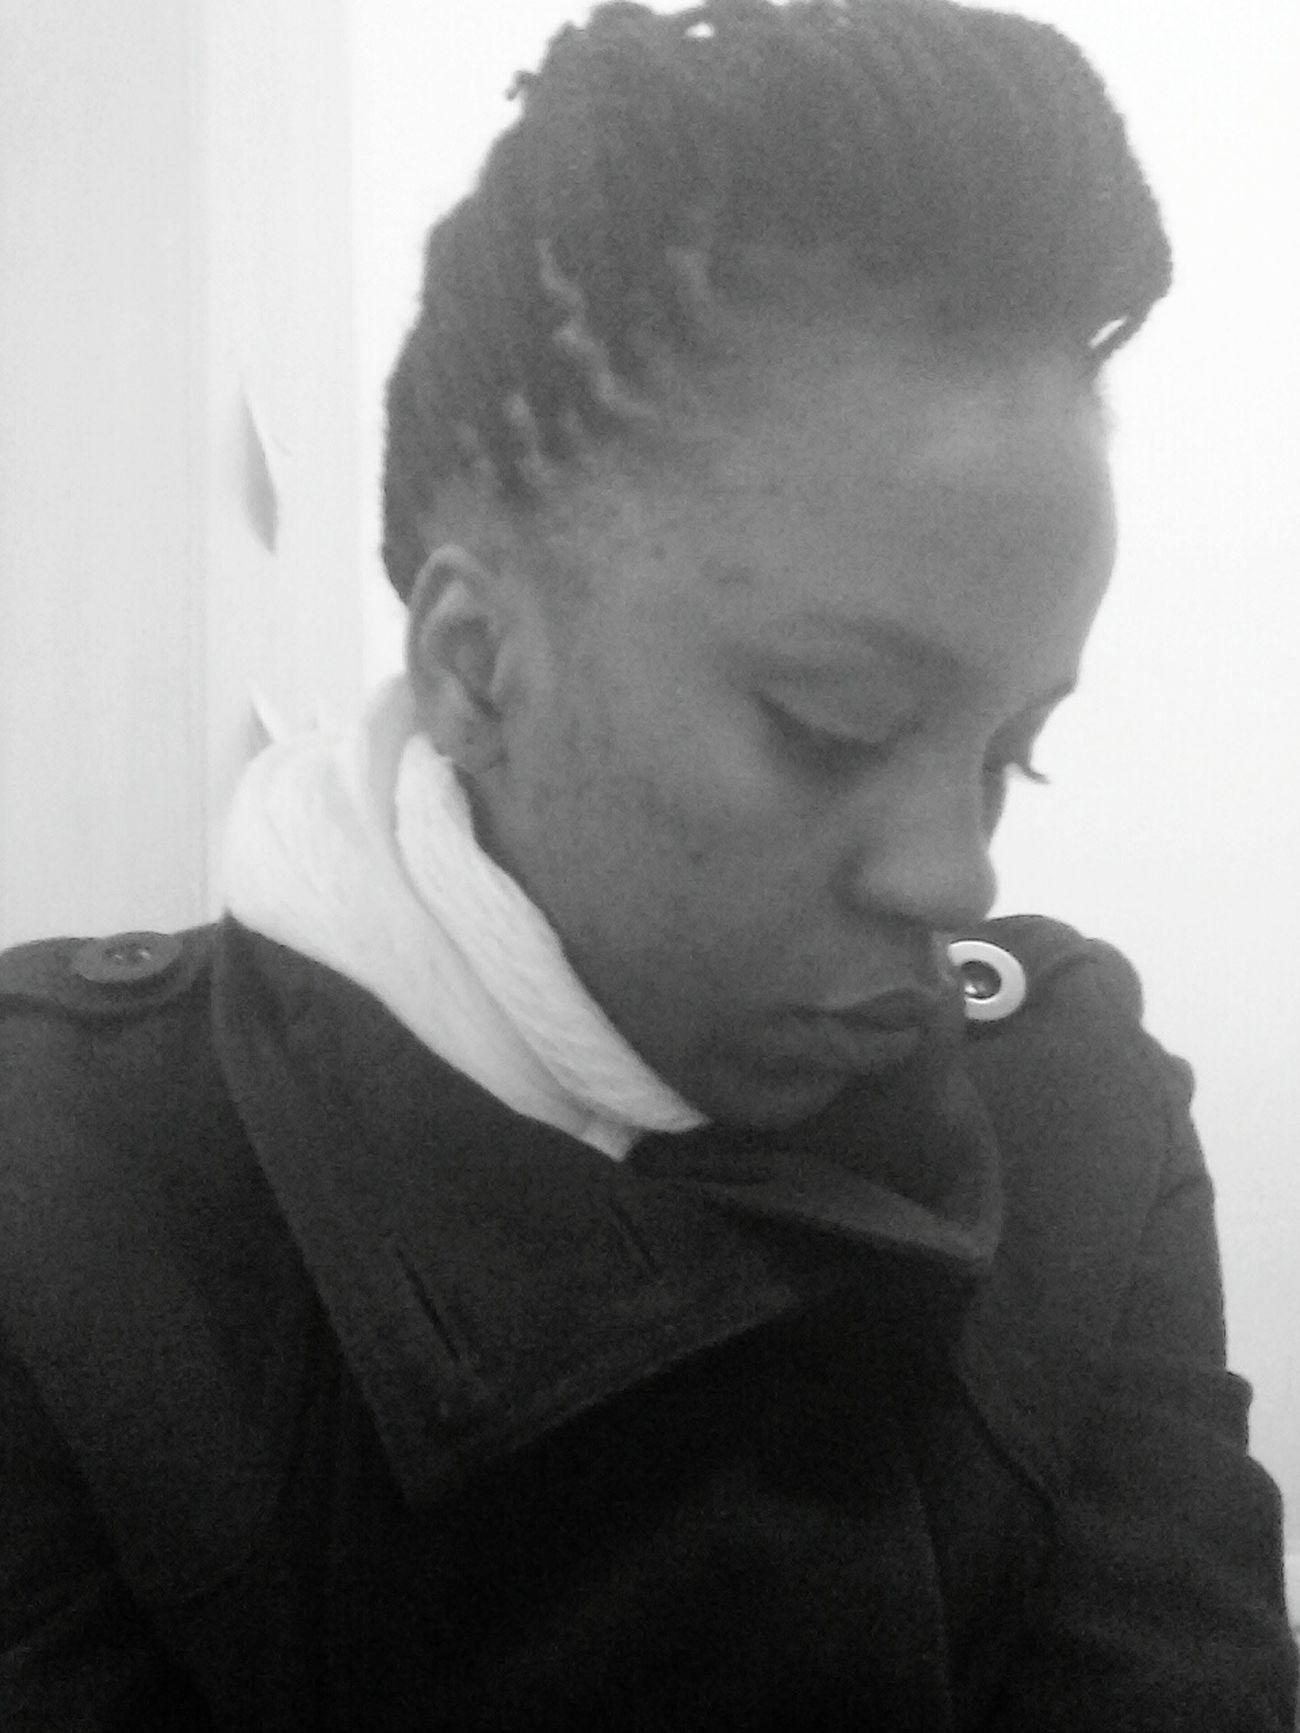 yarn twist. new years eve. Hairstyle Black&white Turkey Ankara Hairdresser Naturalhair 2014 Chabota Snsoko First Eyeem Photo